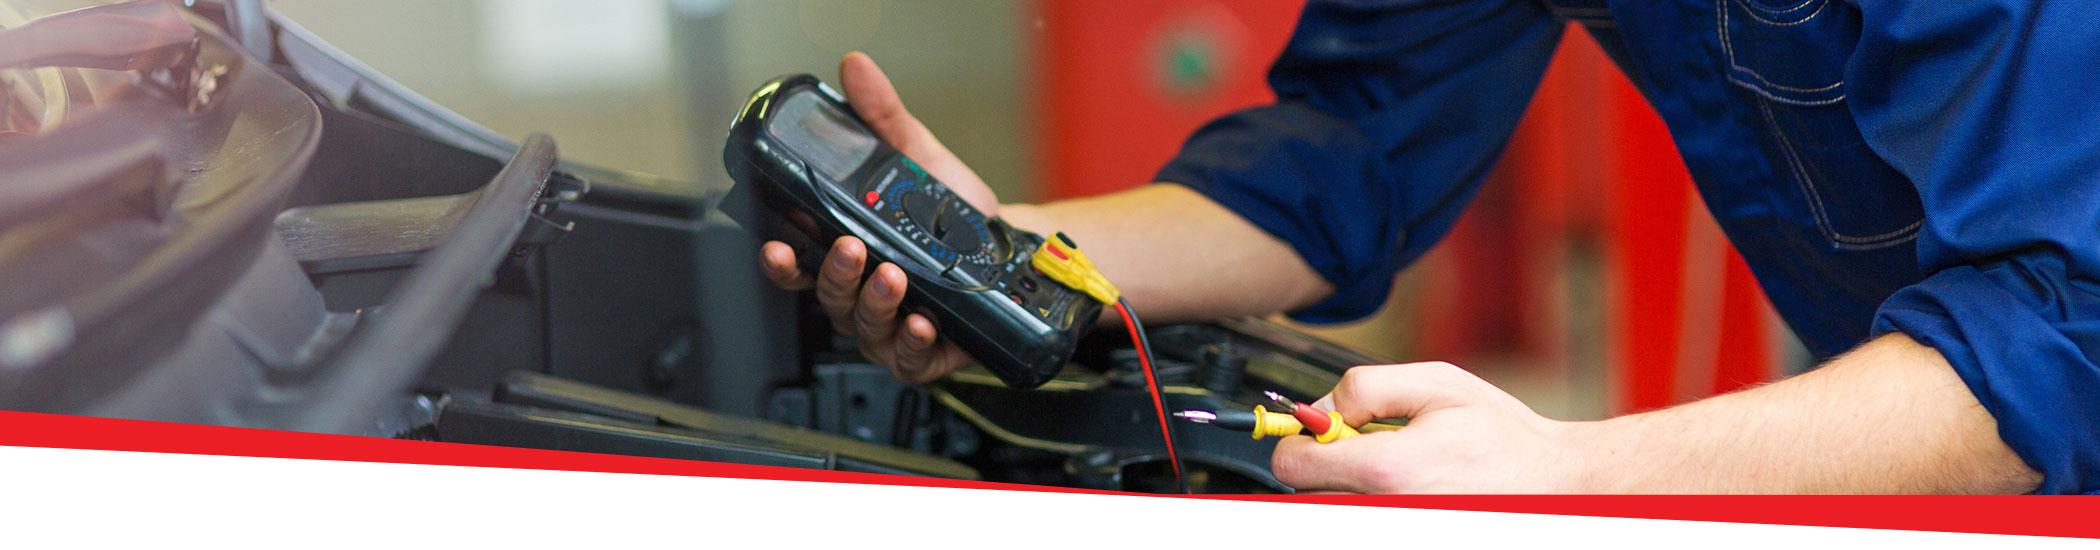 Check Engine Auto Diagnostics Reno Mechanic Shop